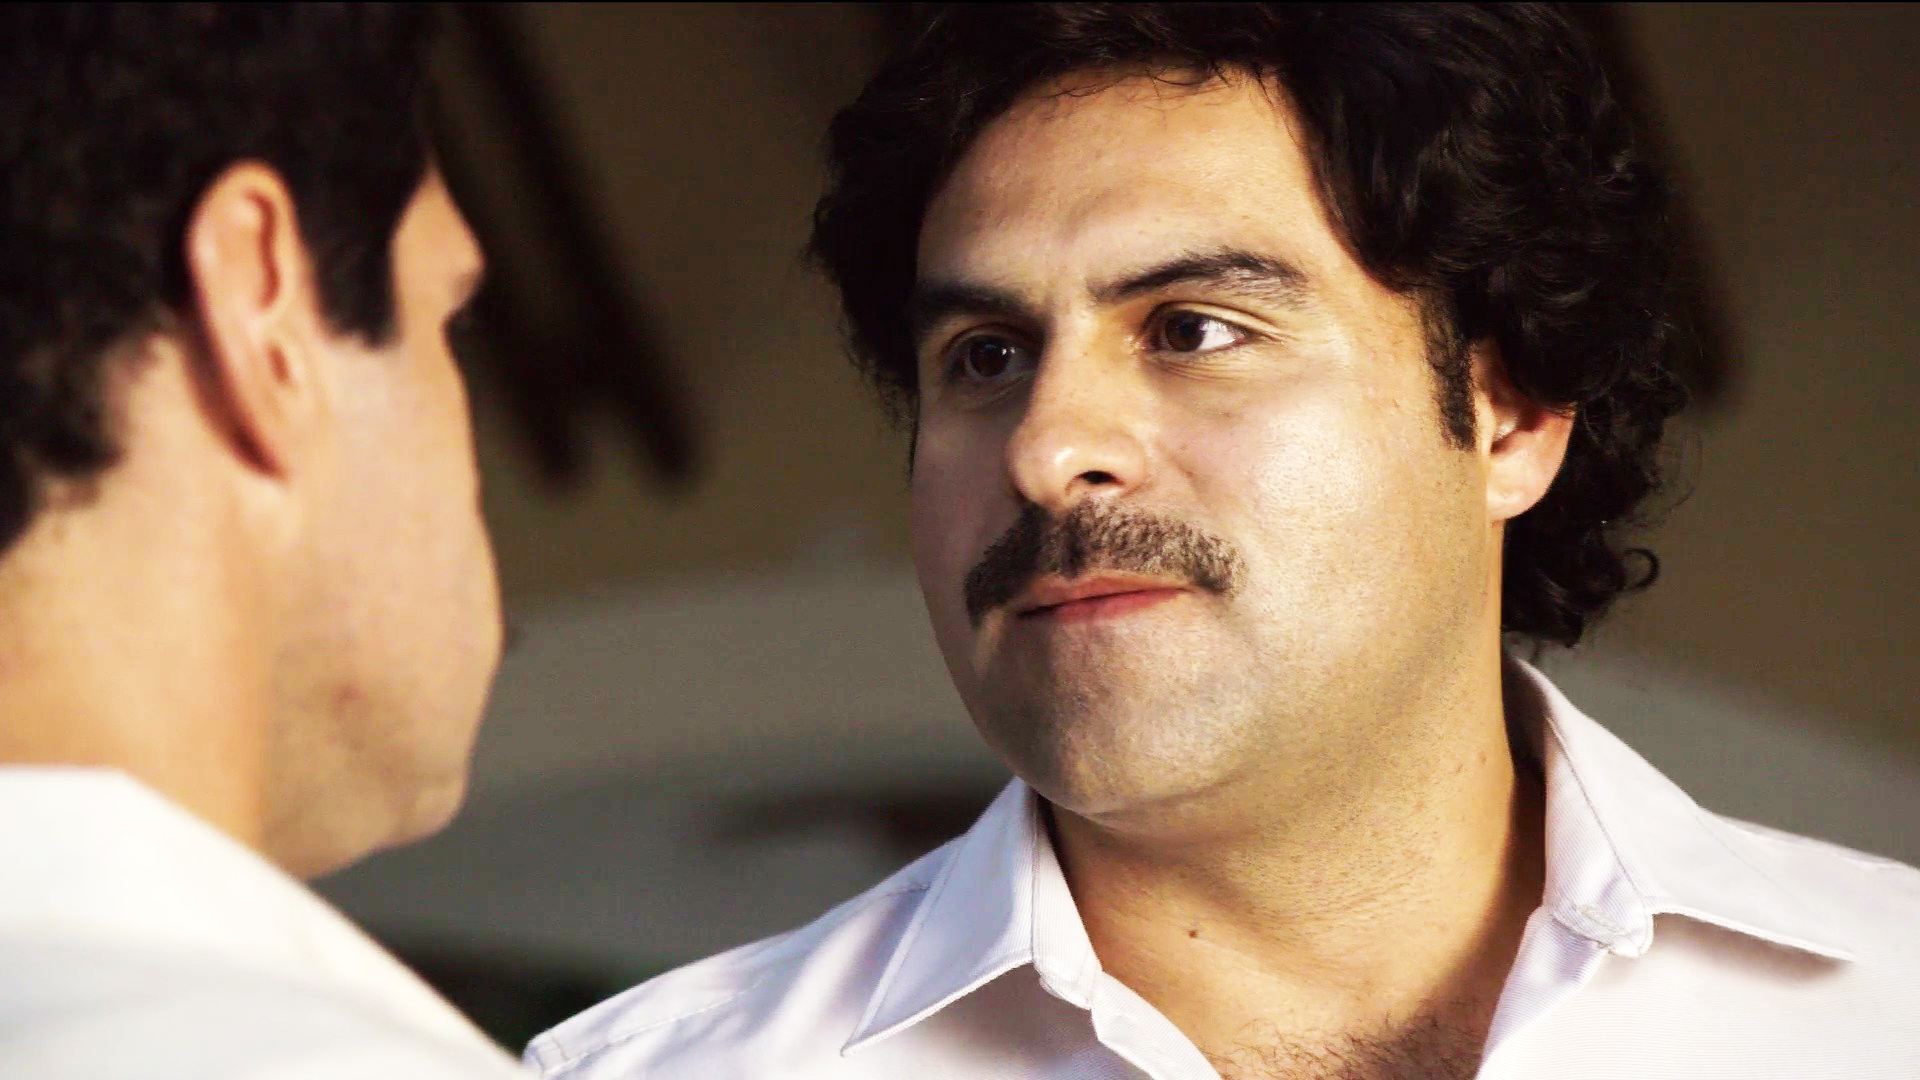 Pablo Escobar Vs Chapo >> Pablo Escobar tested the power of 'El Chapo' to traffic his drug - Univision